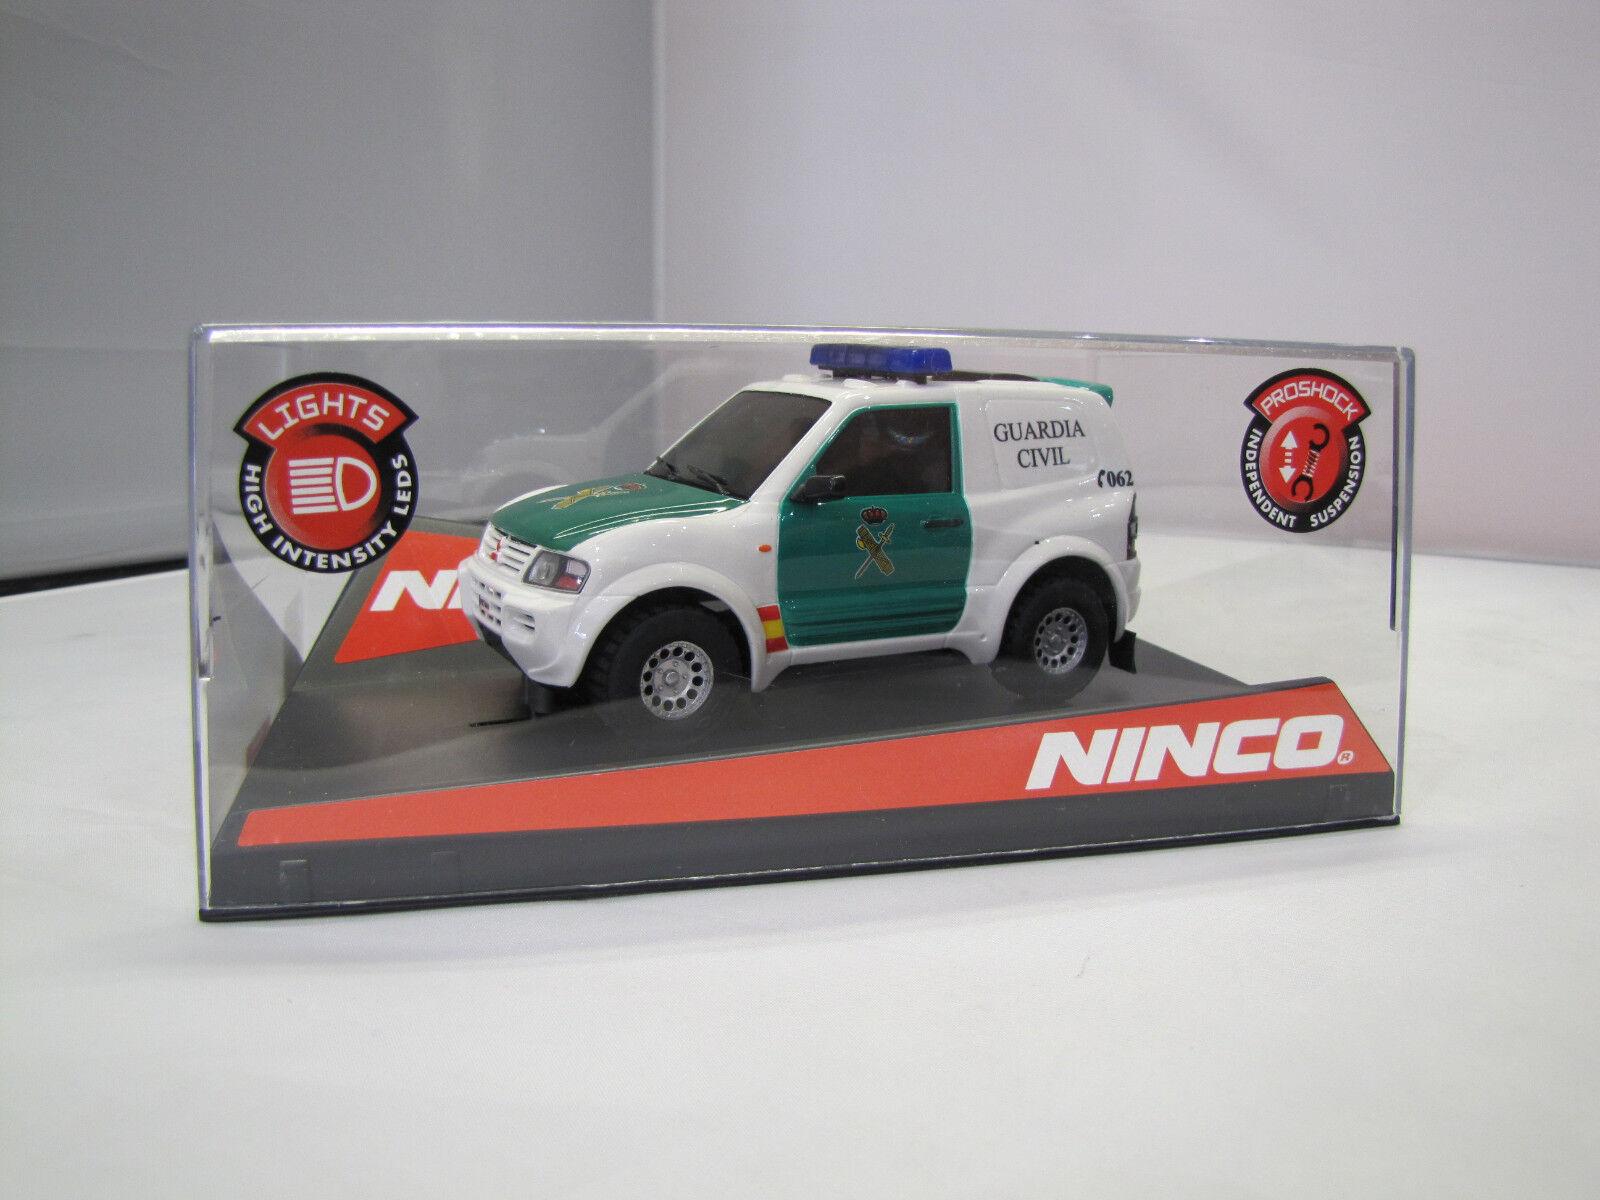 50519 Ninco - Mitsubishi Pajero Guardia Civil - Slot Car 1 32  | Haltbarer Service